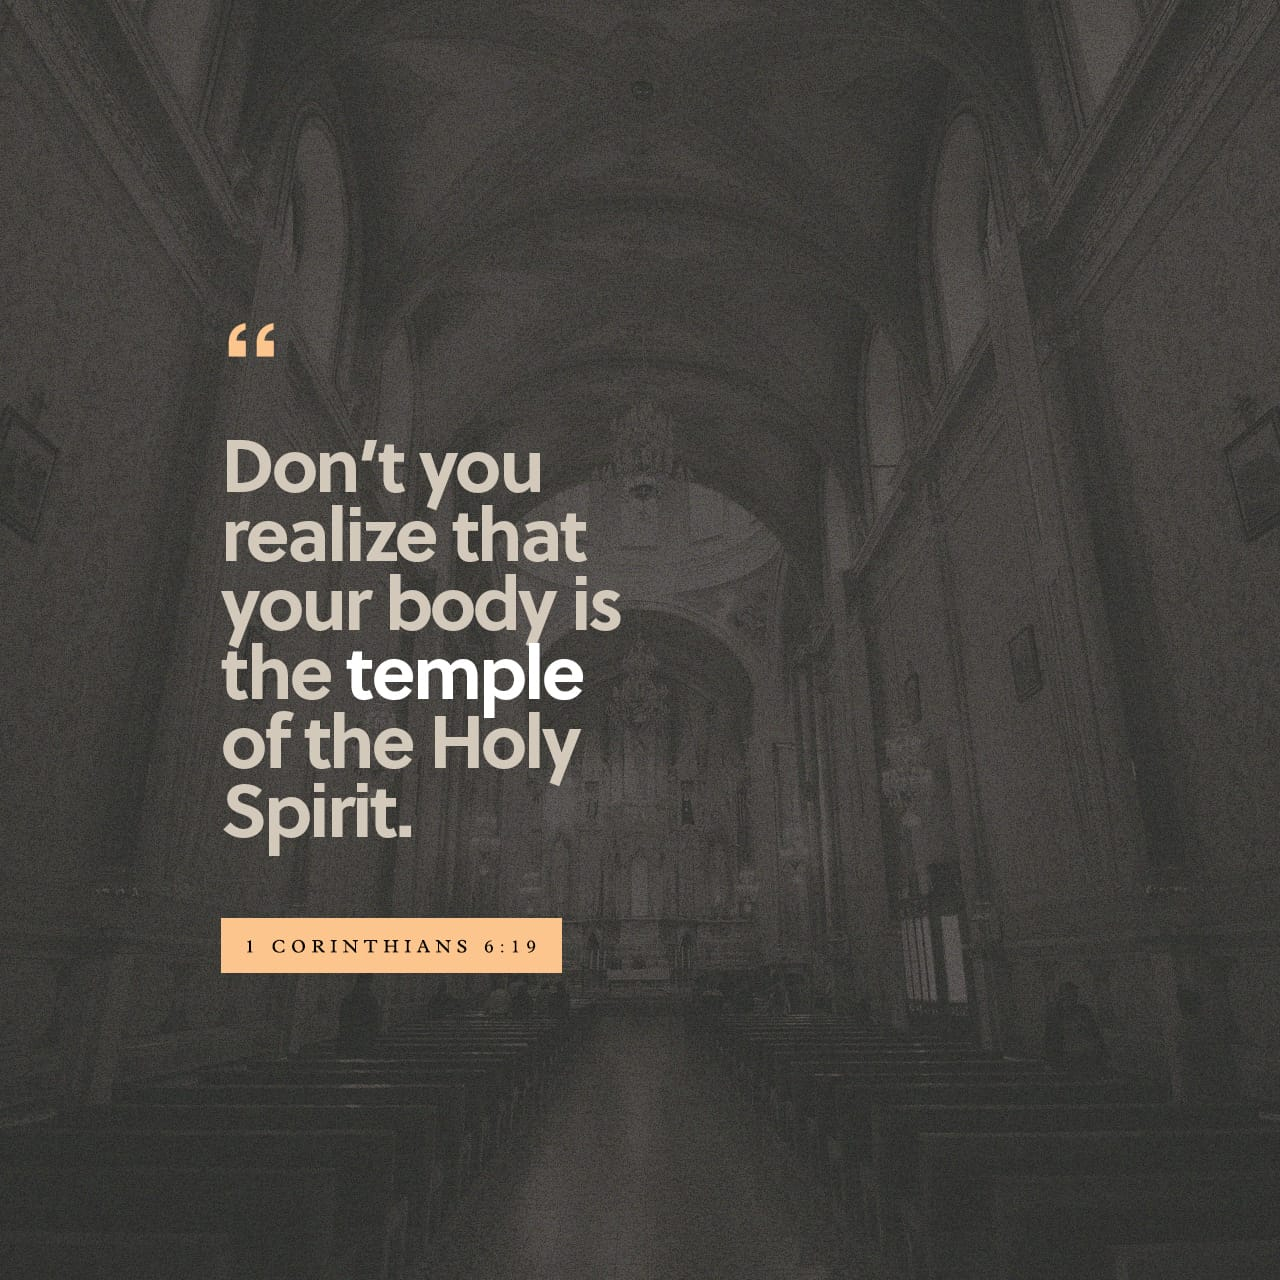 Verse of the Day - 1 Corinthians 6:19 (KJV) | The Bible App | Bible com